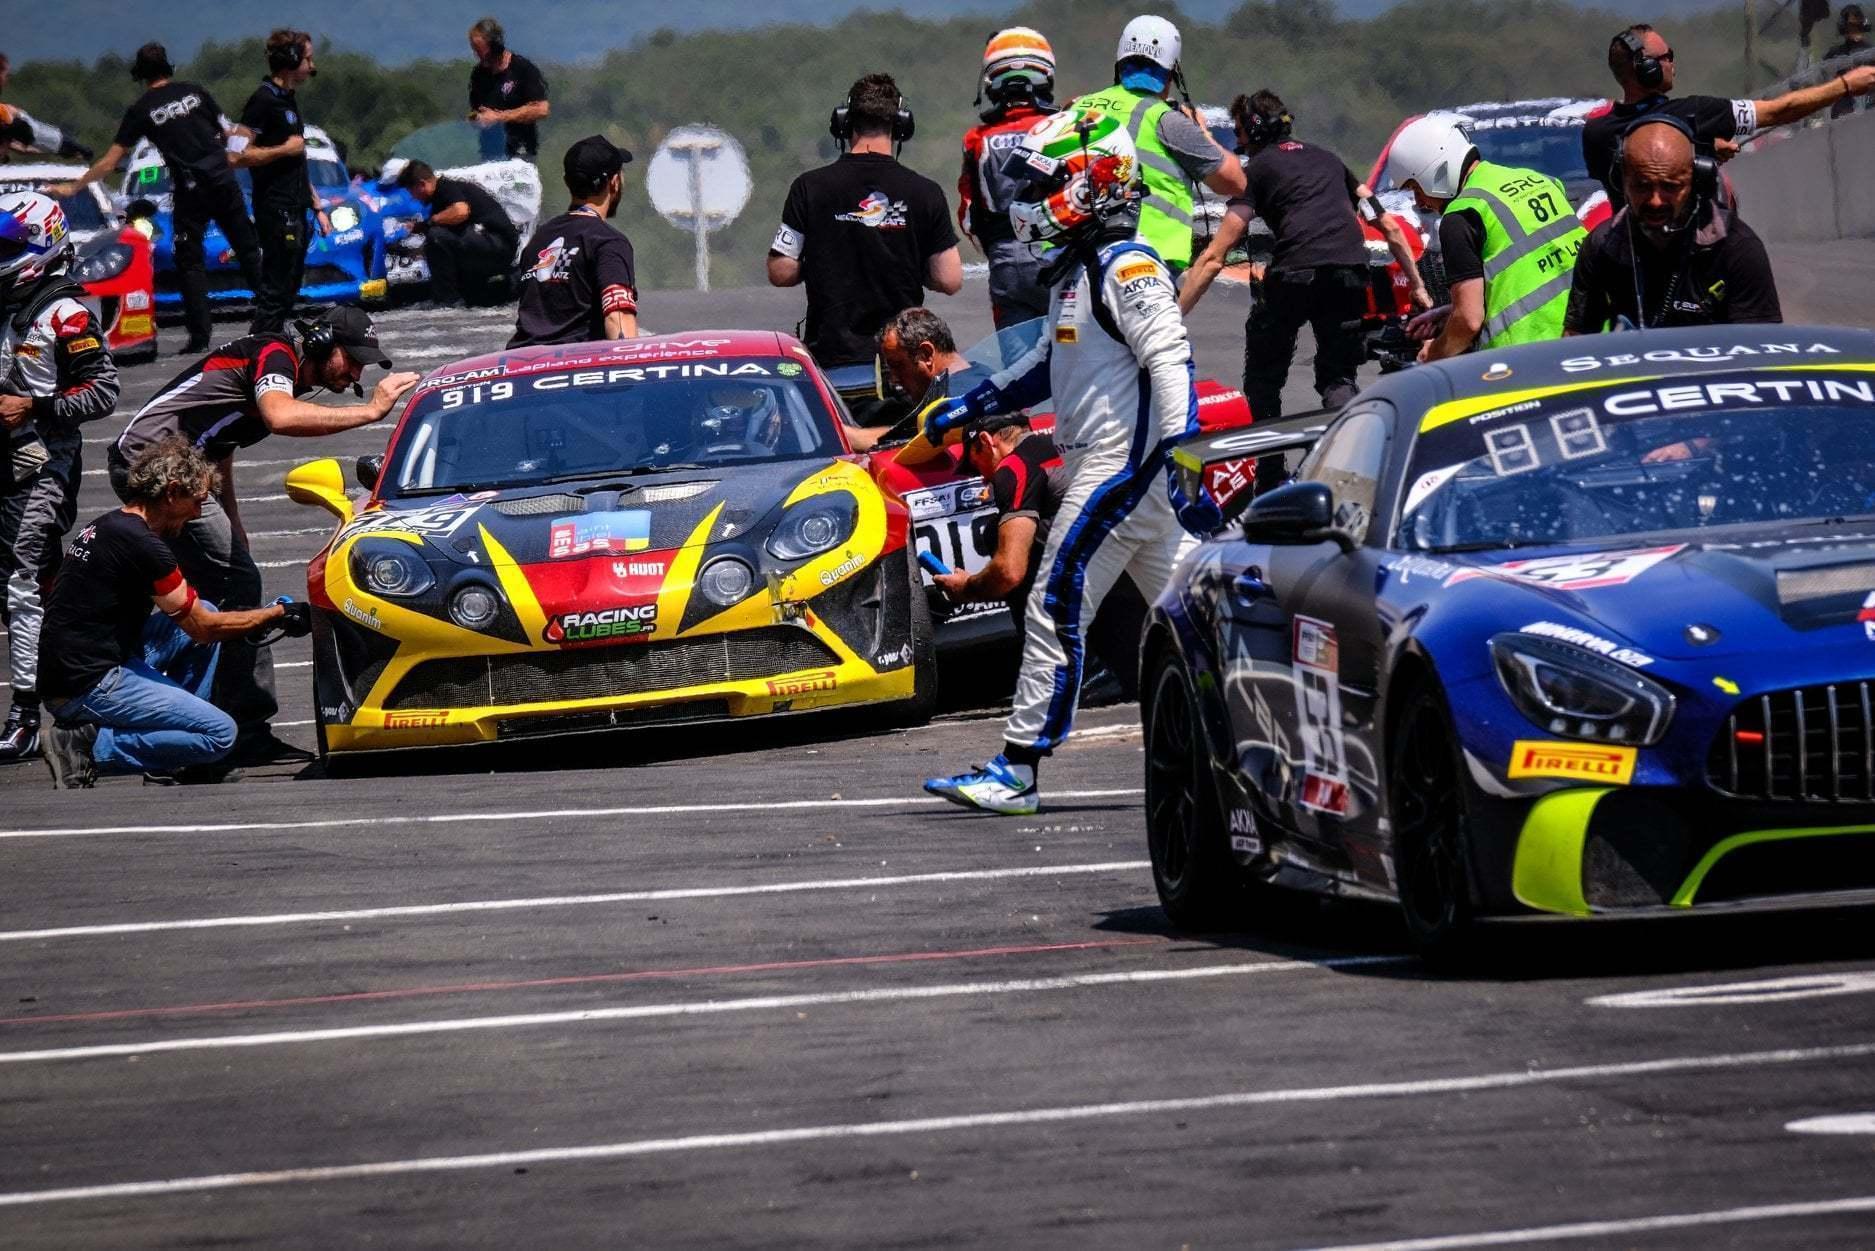 FFSA GT: CMR reprend la main Lédenon ! (Course 2) 13